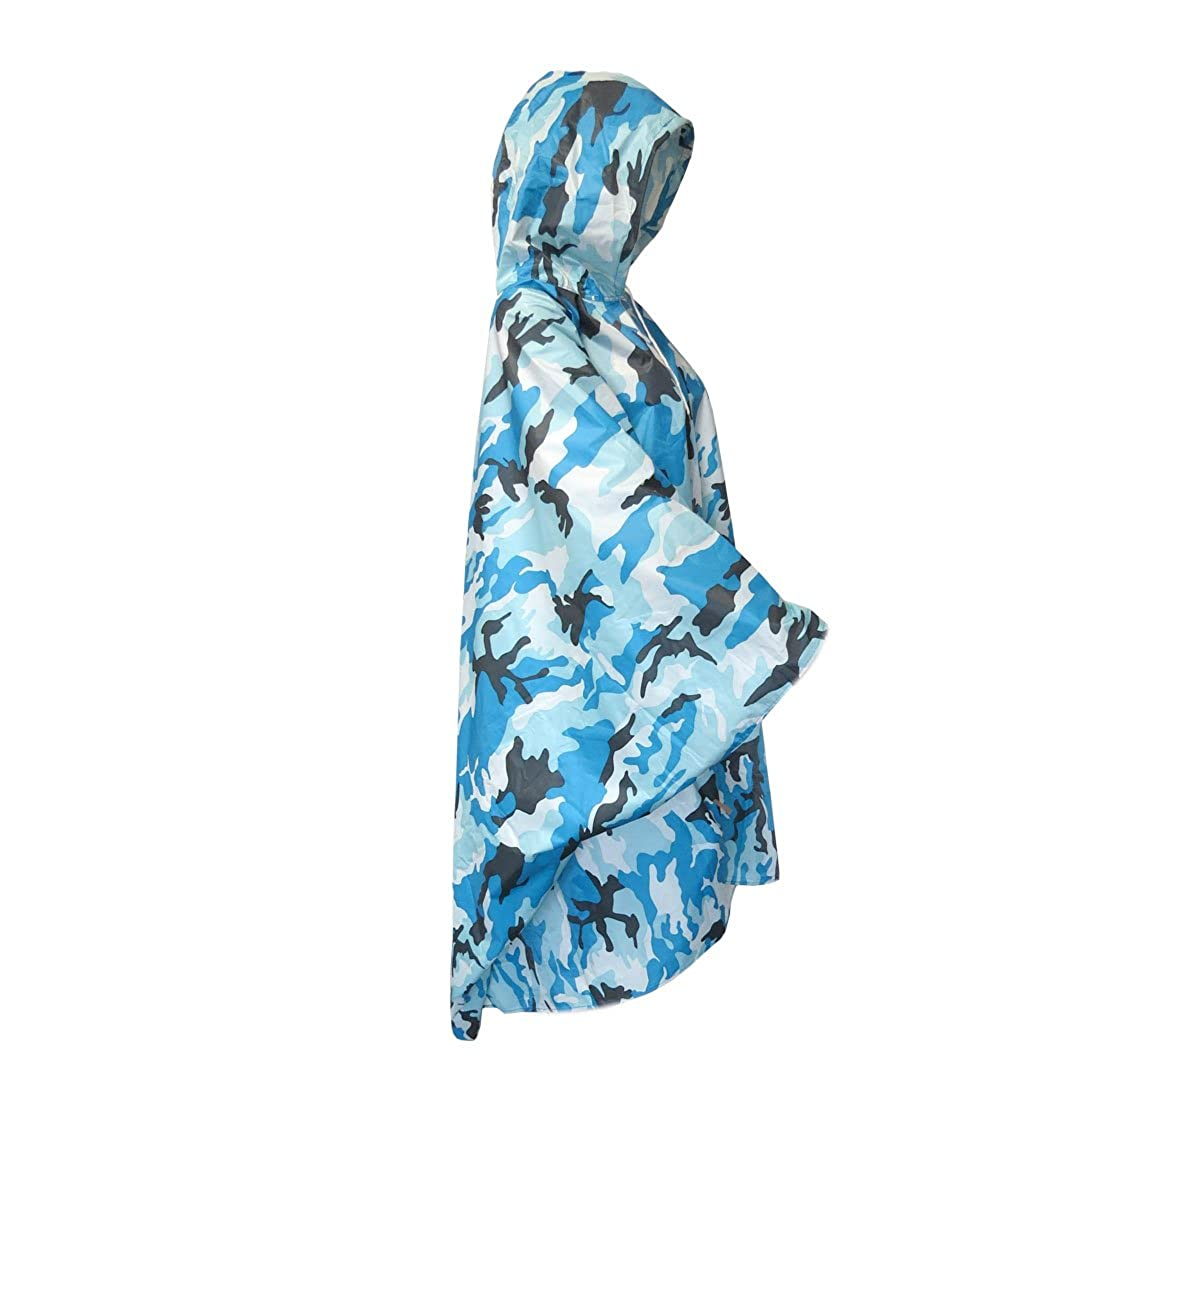 Sonia Originelli Regenponcho Regencape Jacke Militä r Tarnfarbe Rain Cape Fahrrad T-Cape4-Militä r-blau